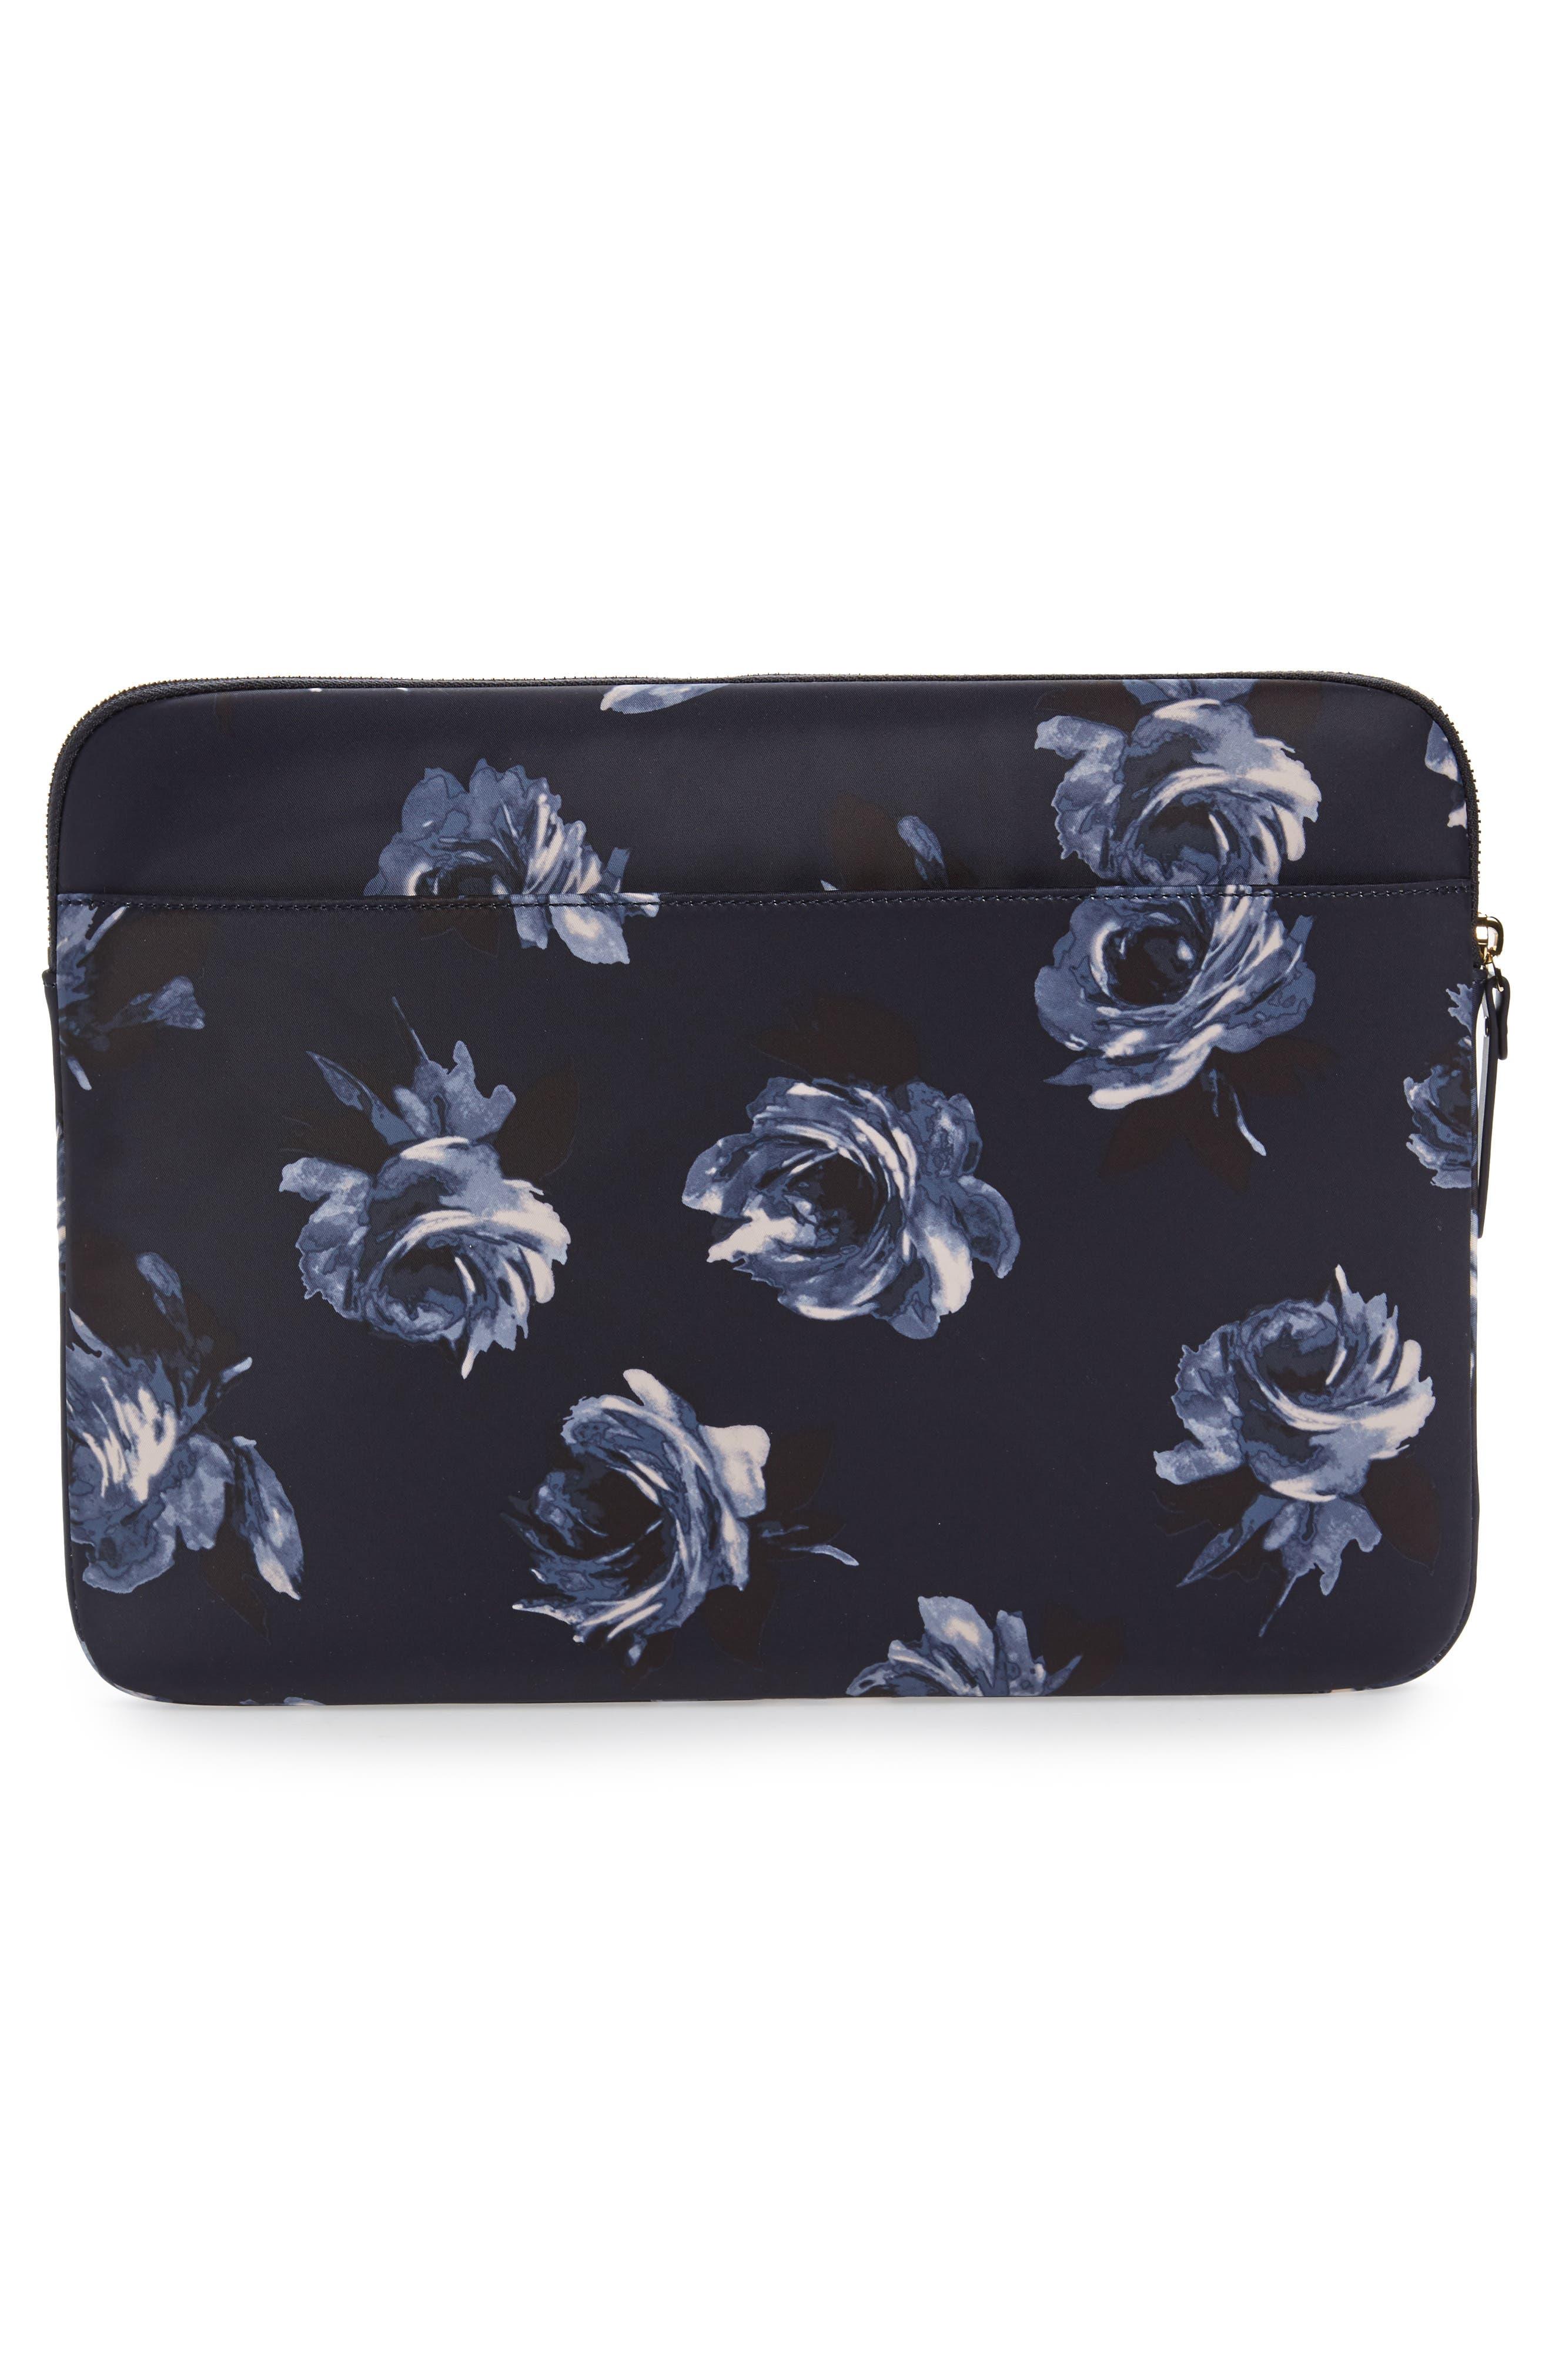 night rose 13-Inch laptop sleeve,                             Alternate thumbnail 3, color,